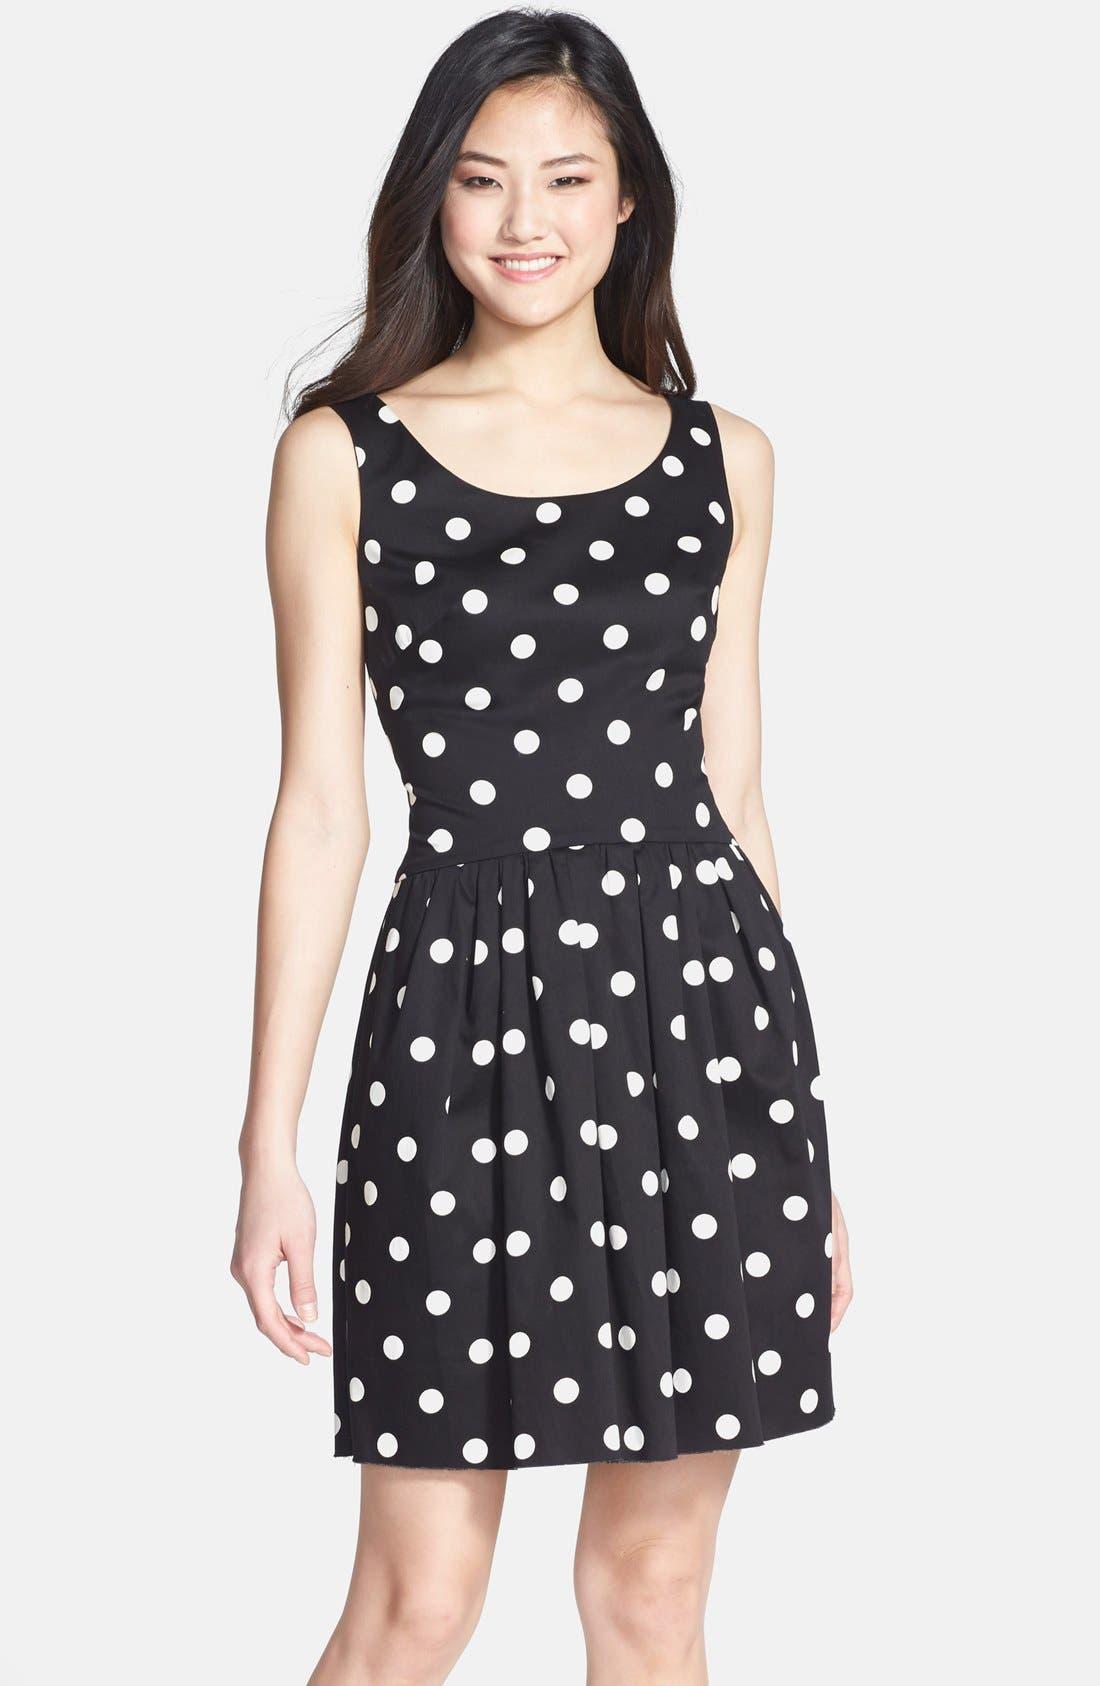 Alternate Image 1 Selected - Betsey Johnson Polka Dot Bow Detail Fit & Flare Dress